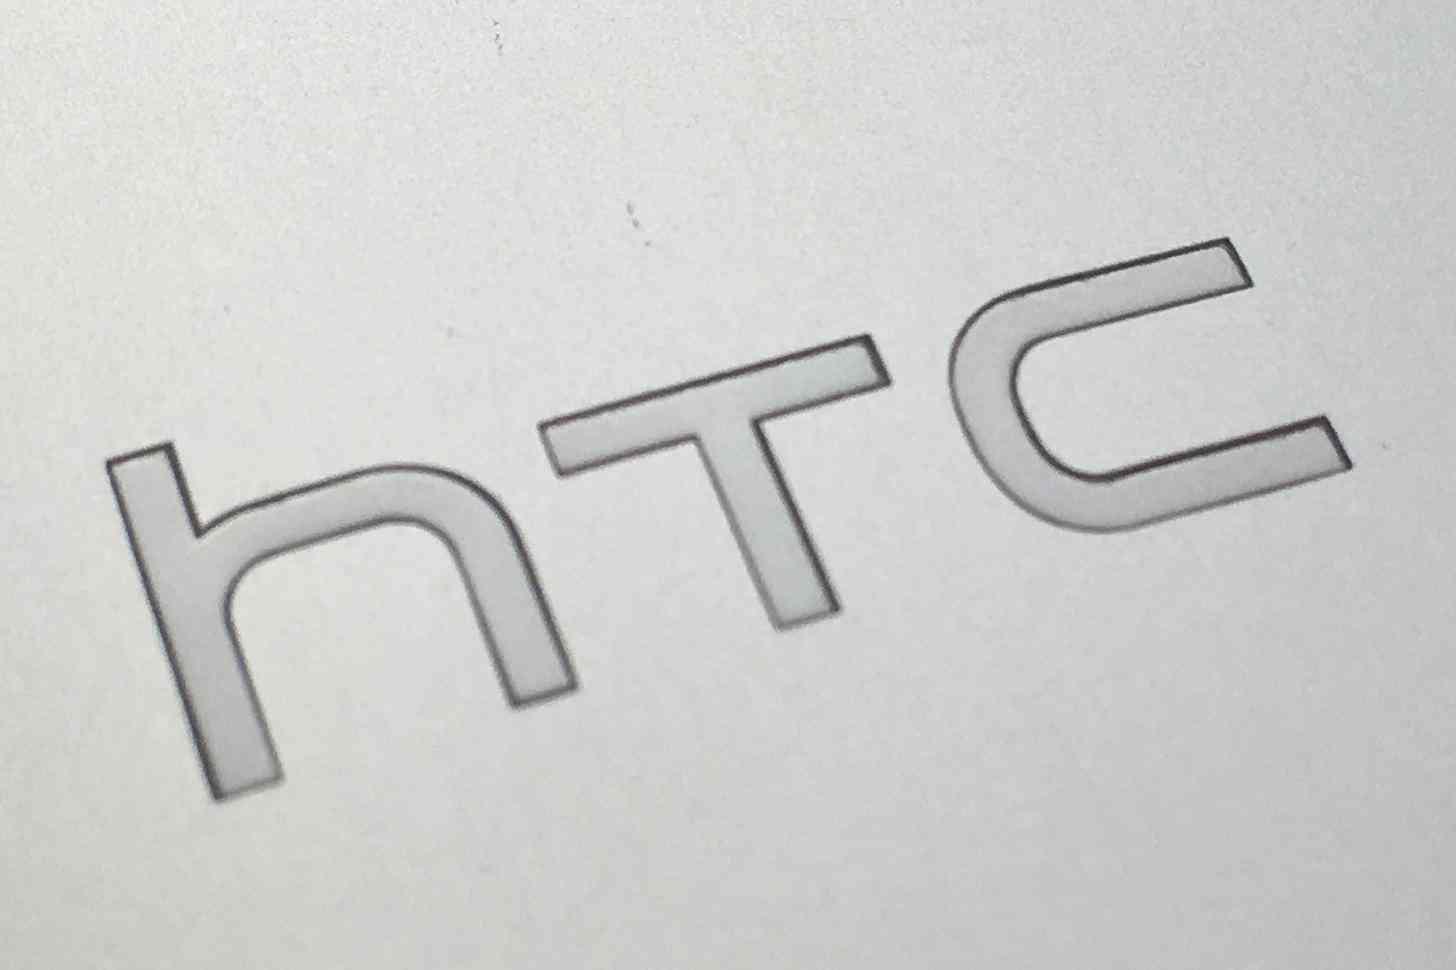 HTC logo One M7 rear